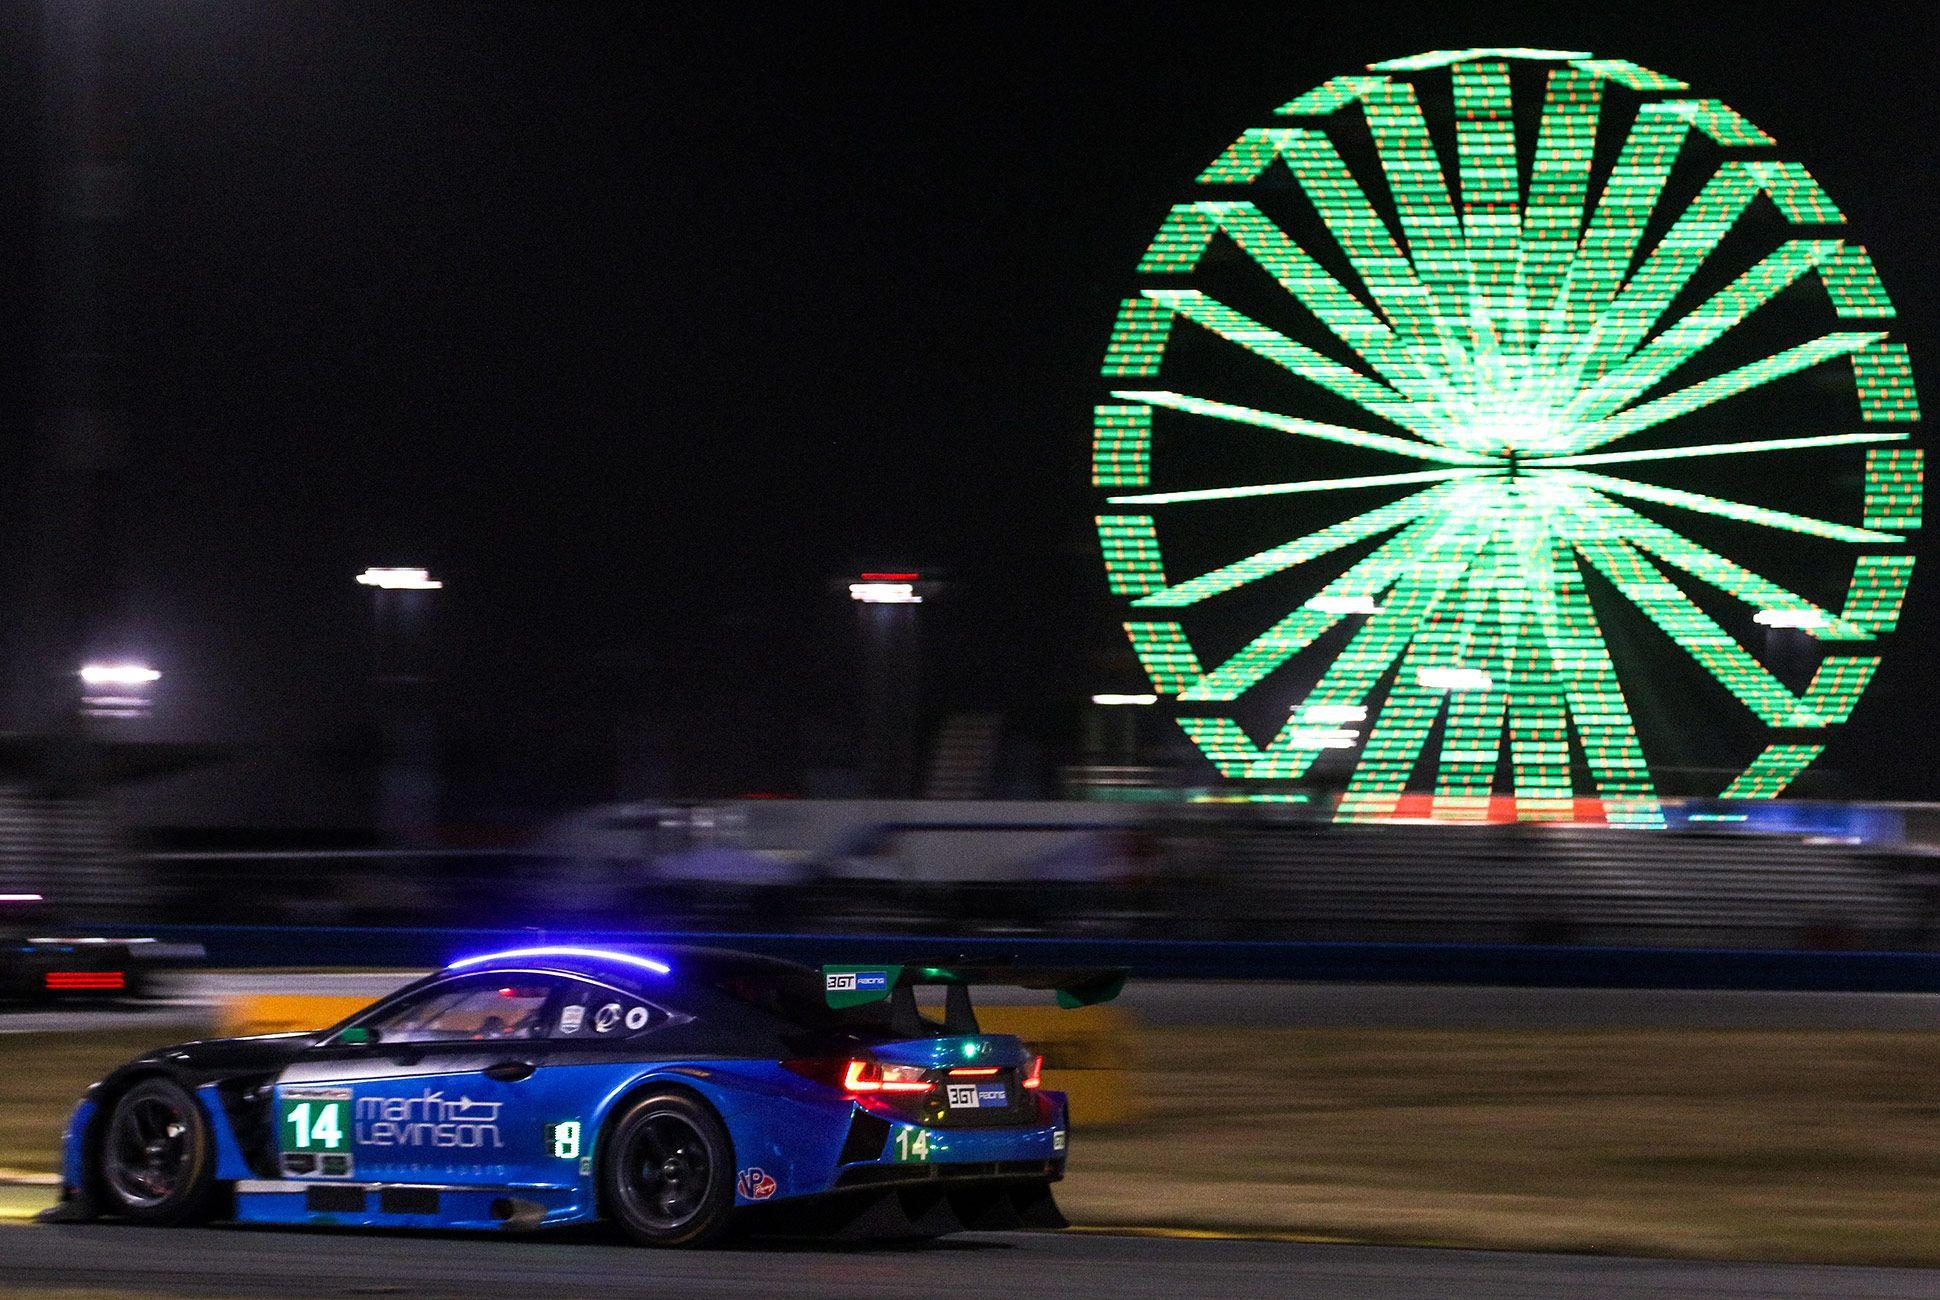 Best-Sports-Cars-of-2018-Daytona-24-Hours-gear-patrol-Lexus-RC-F-GT3-3